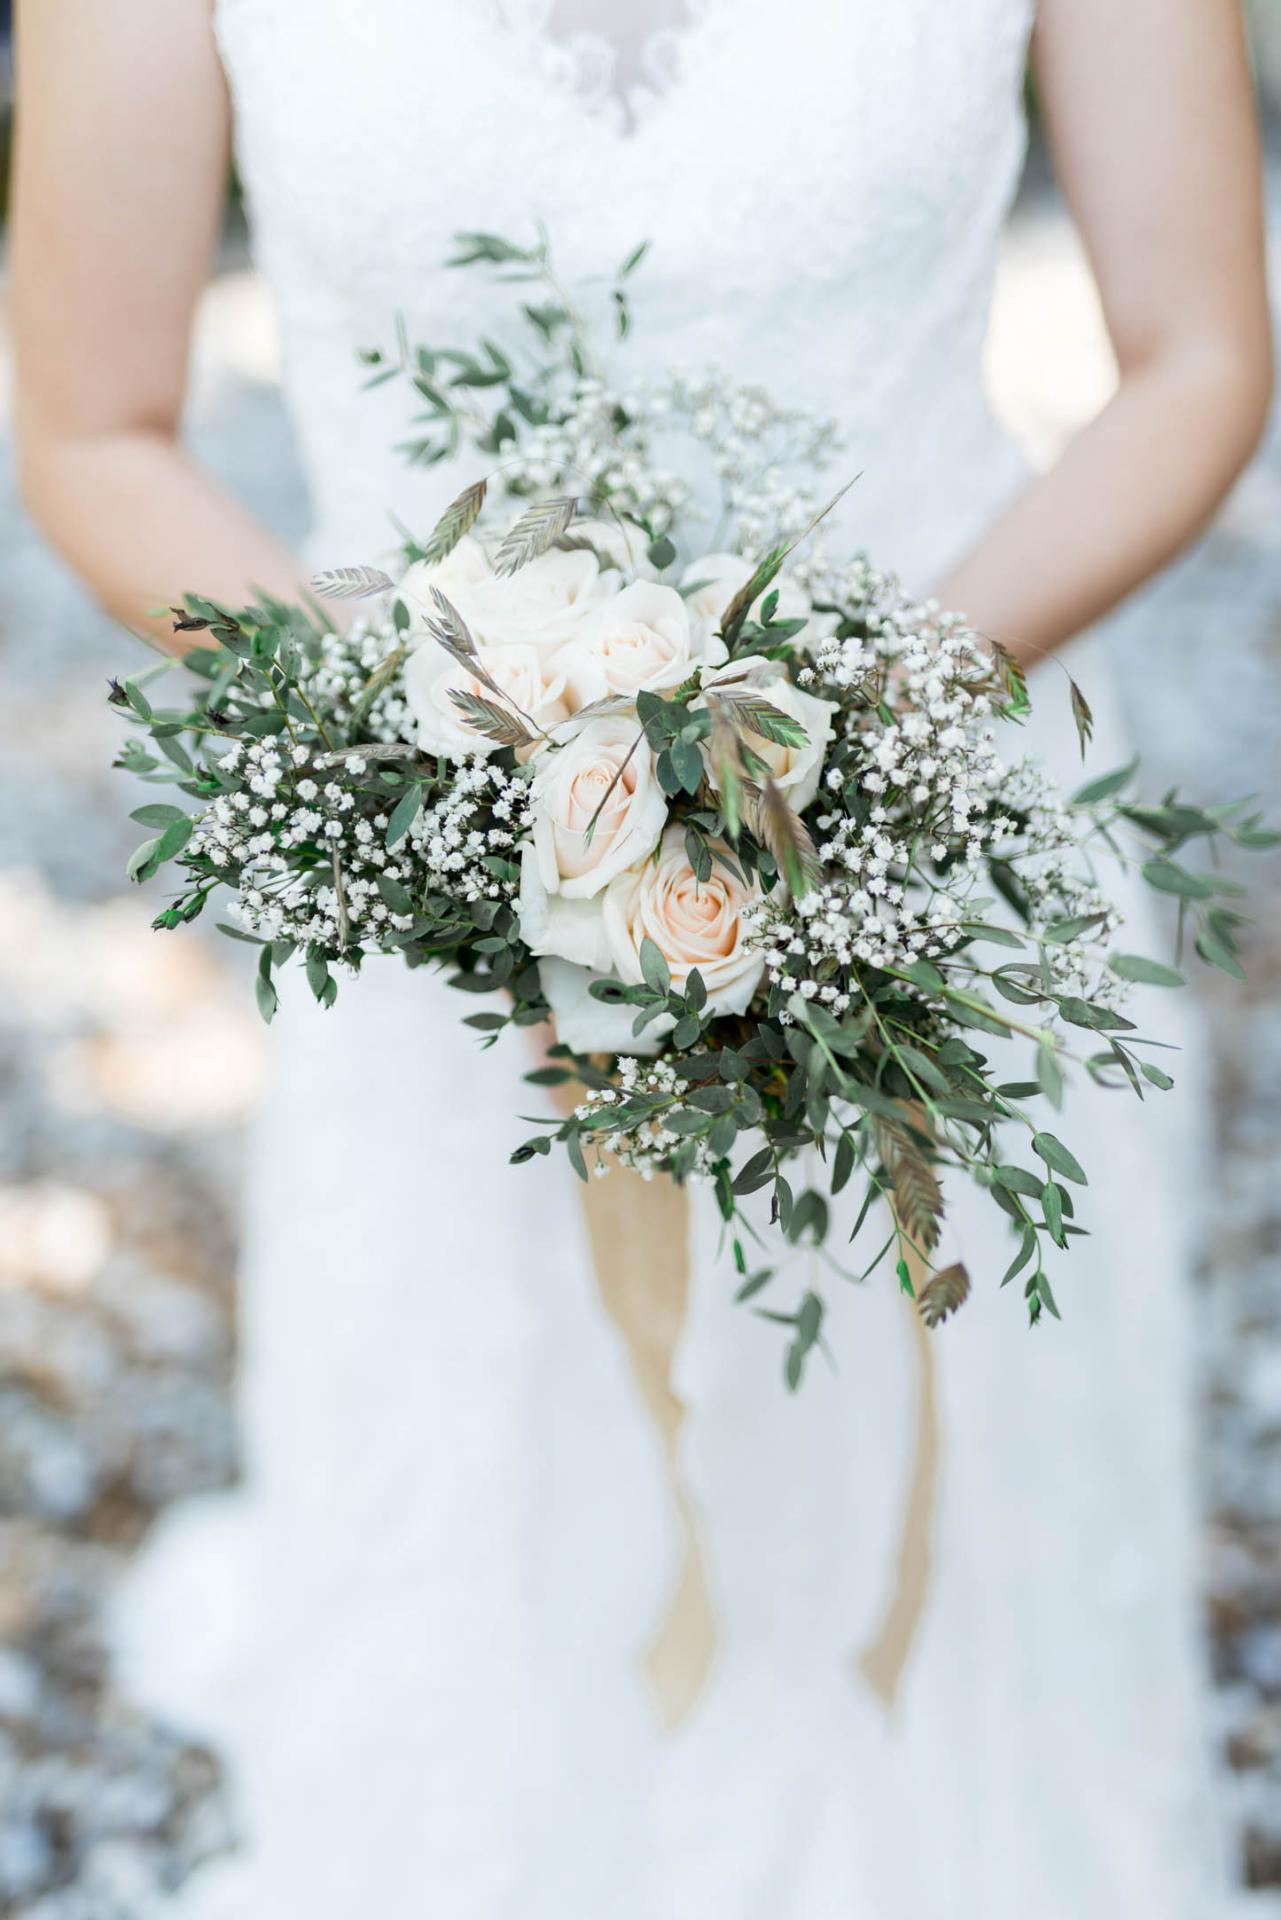 Mariage suisse wedding planner suisse